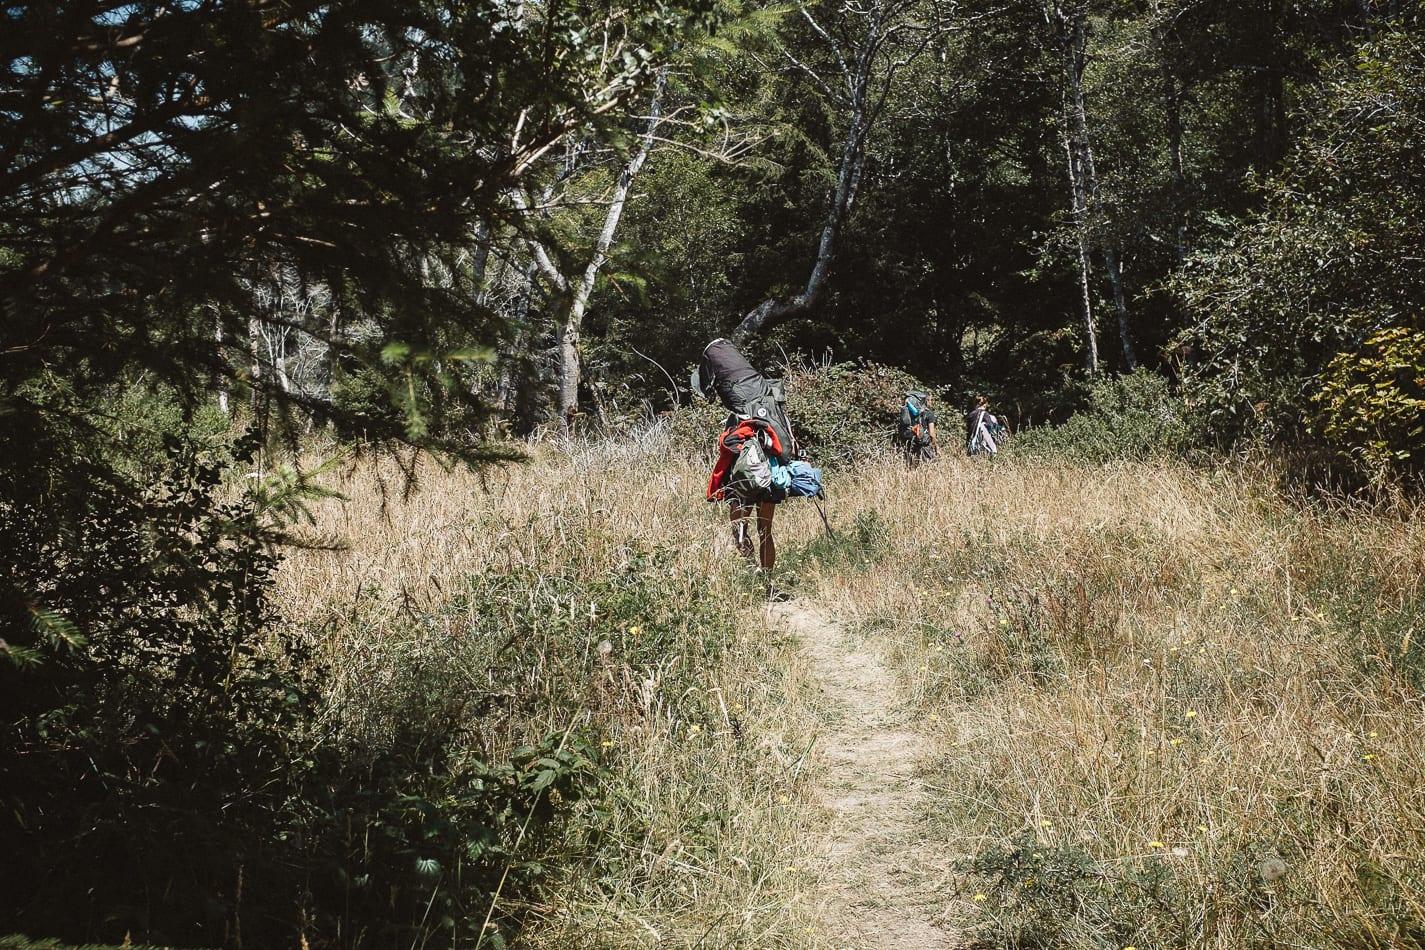 patricks-point-beach-camping-california-adventure-photographer-28